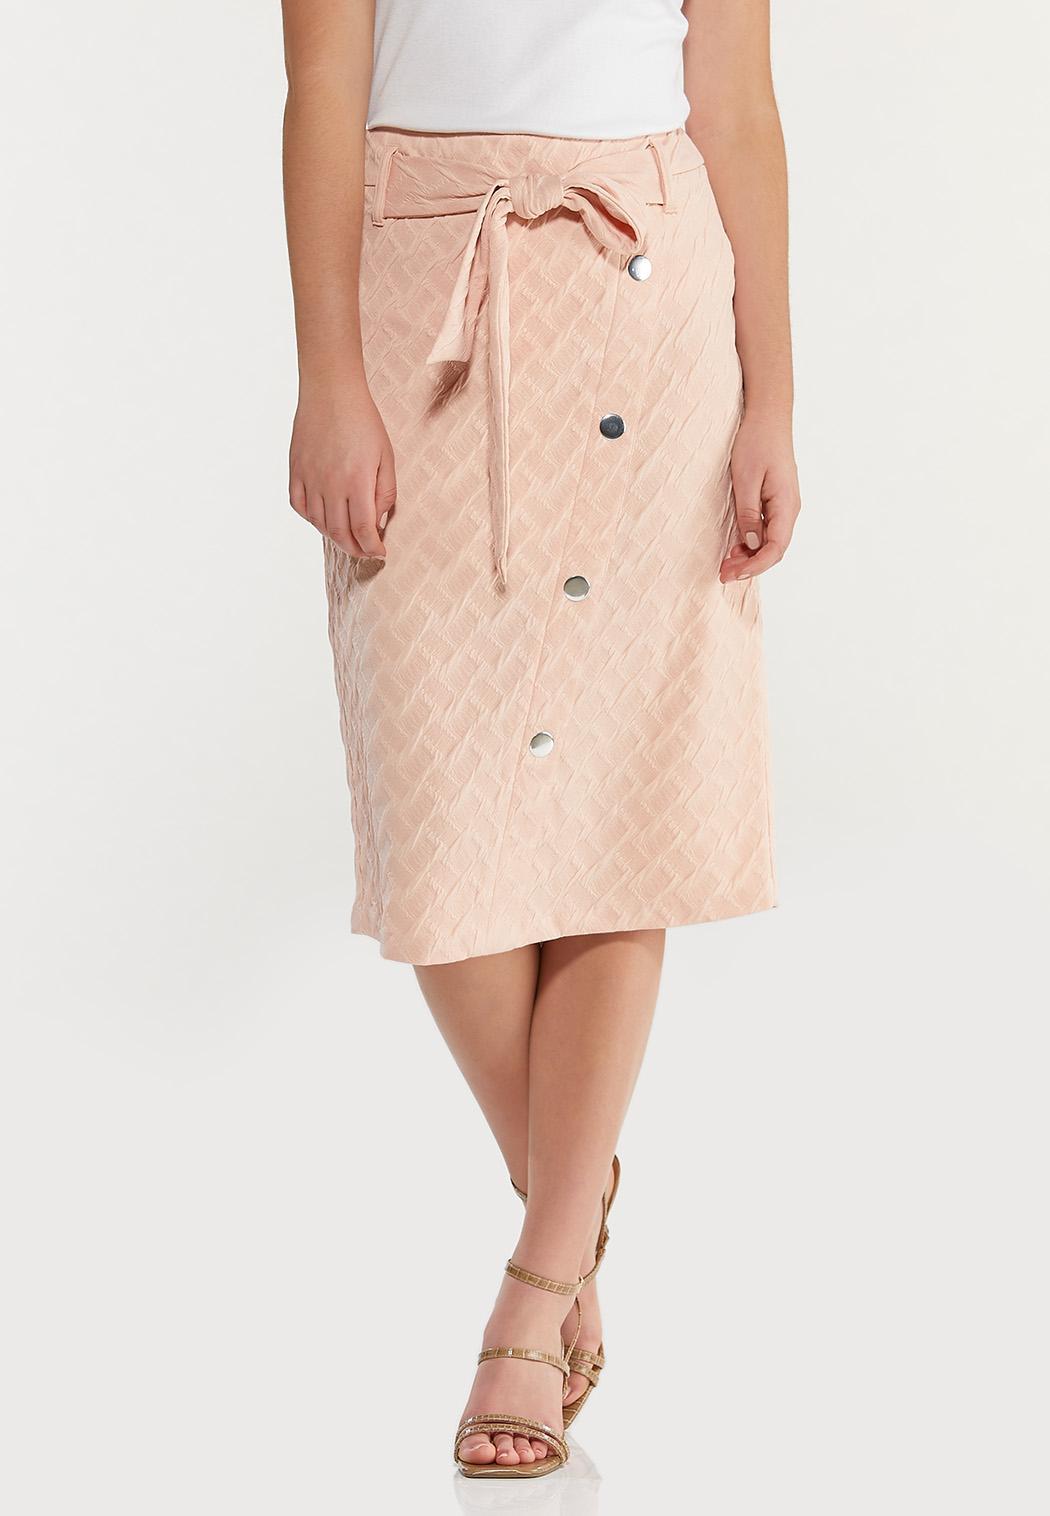 Textured Blush Pencil Skirt